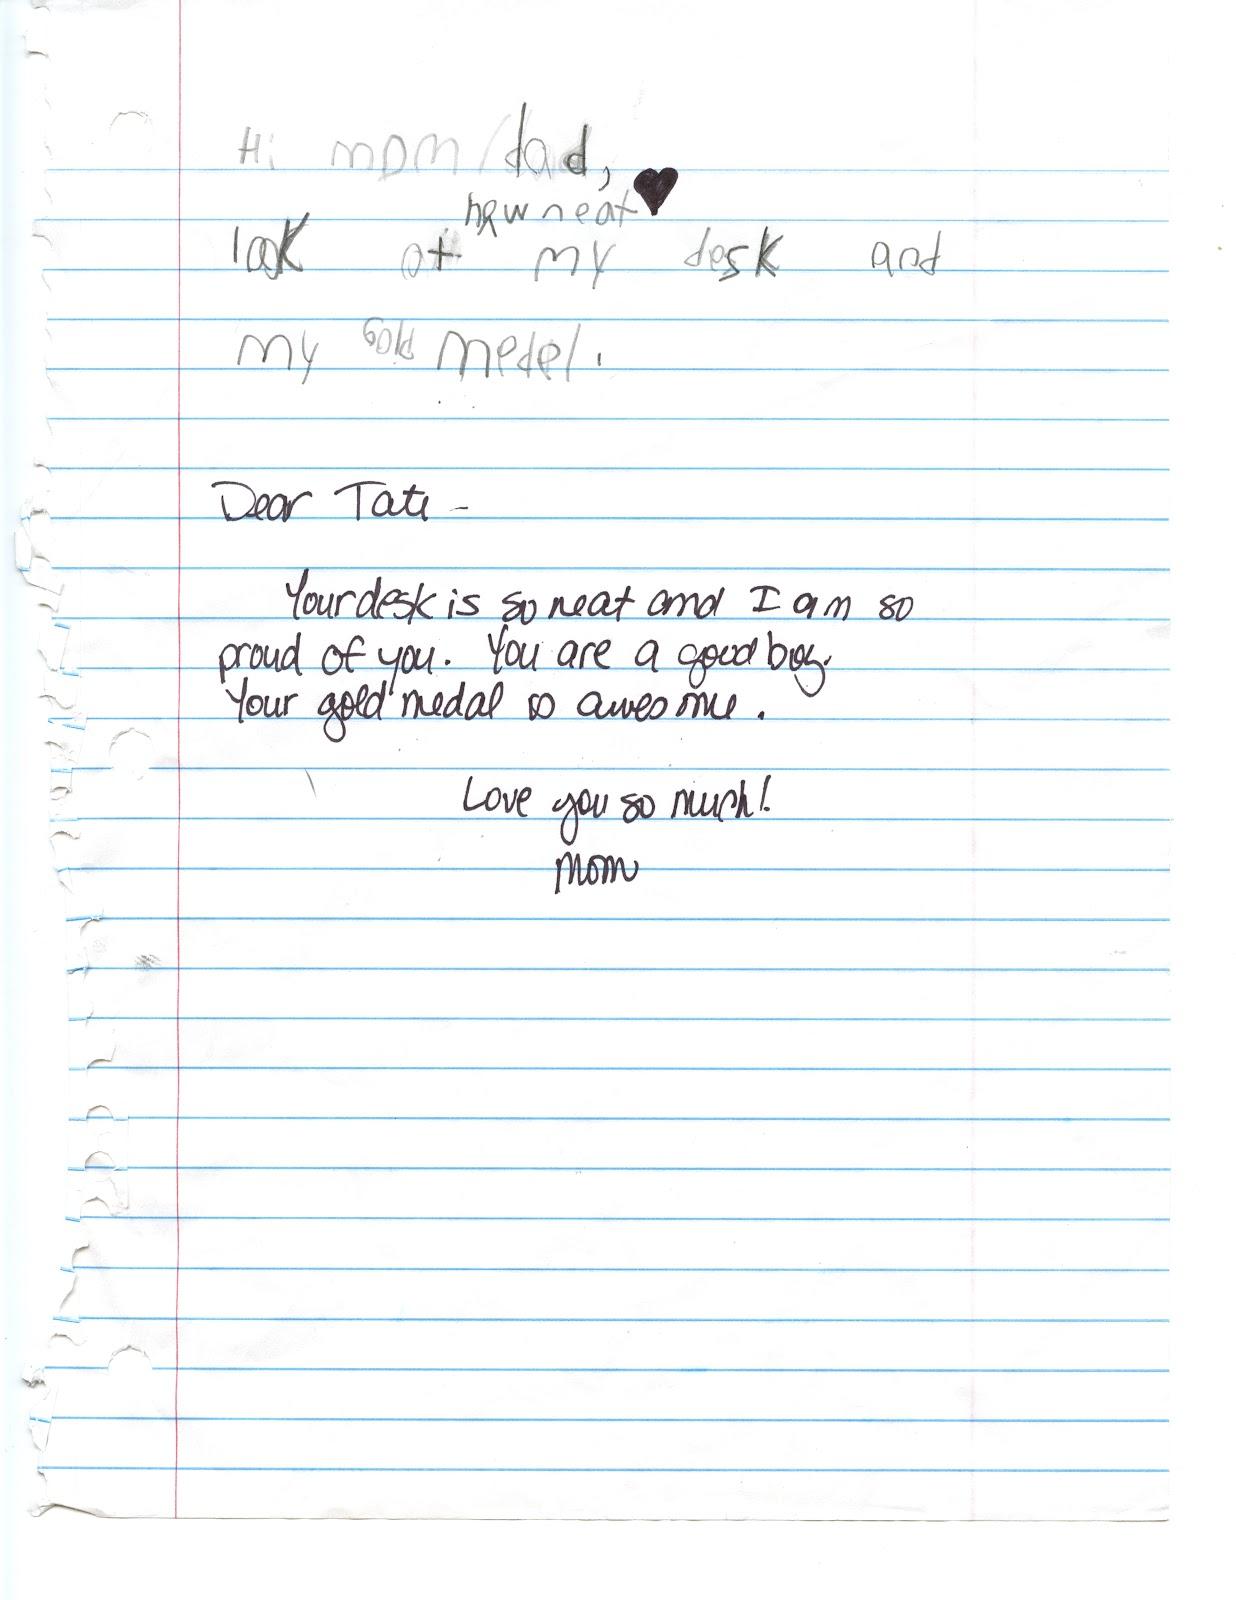 Siblings So Sweet Curriculum Night Letters